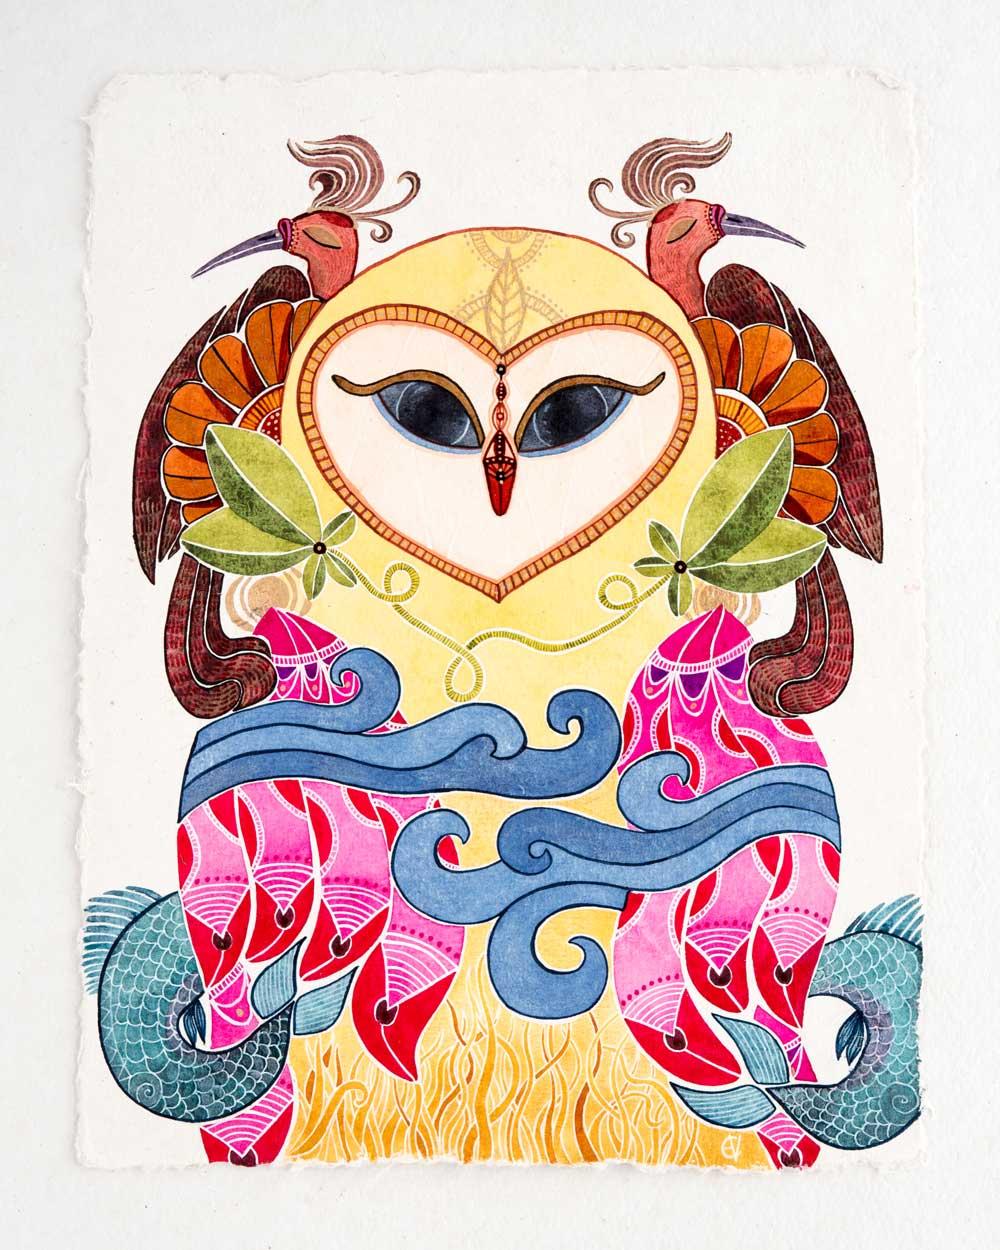 undersea_owl_fishtail_painting_eve_devore.jpg